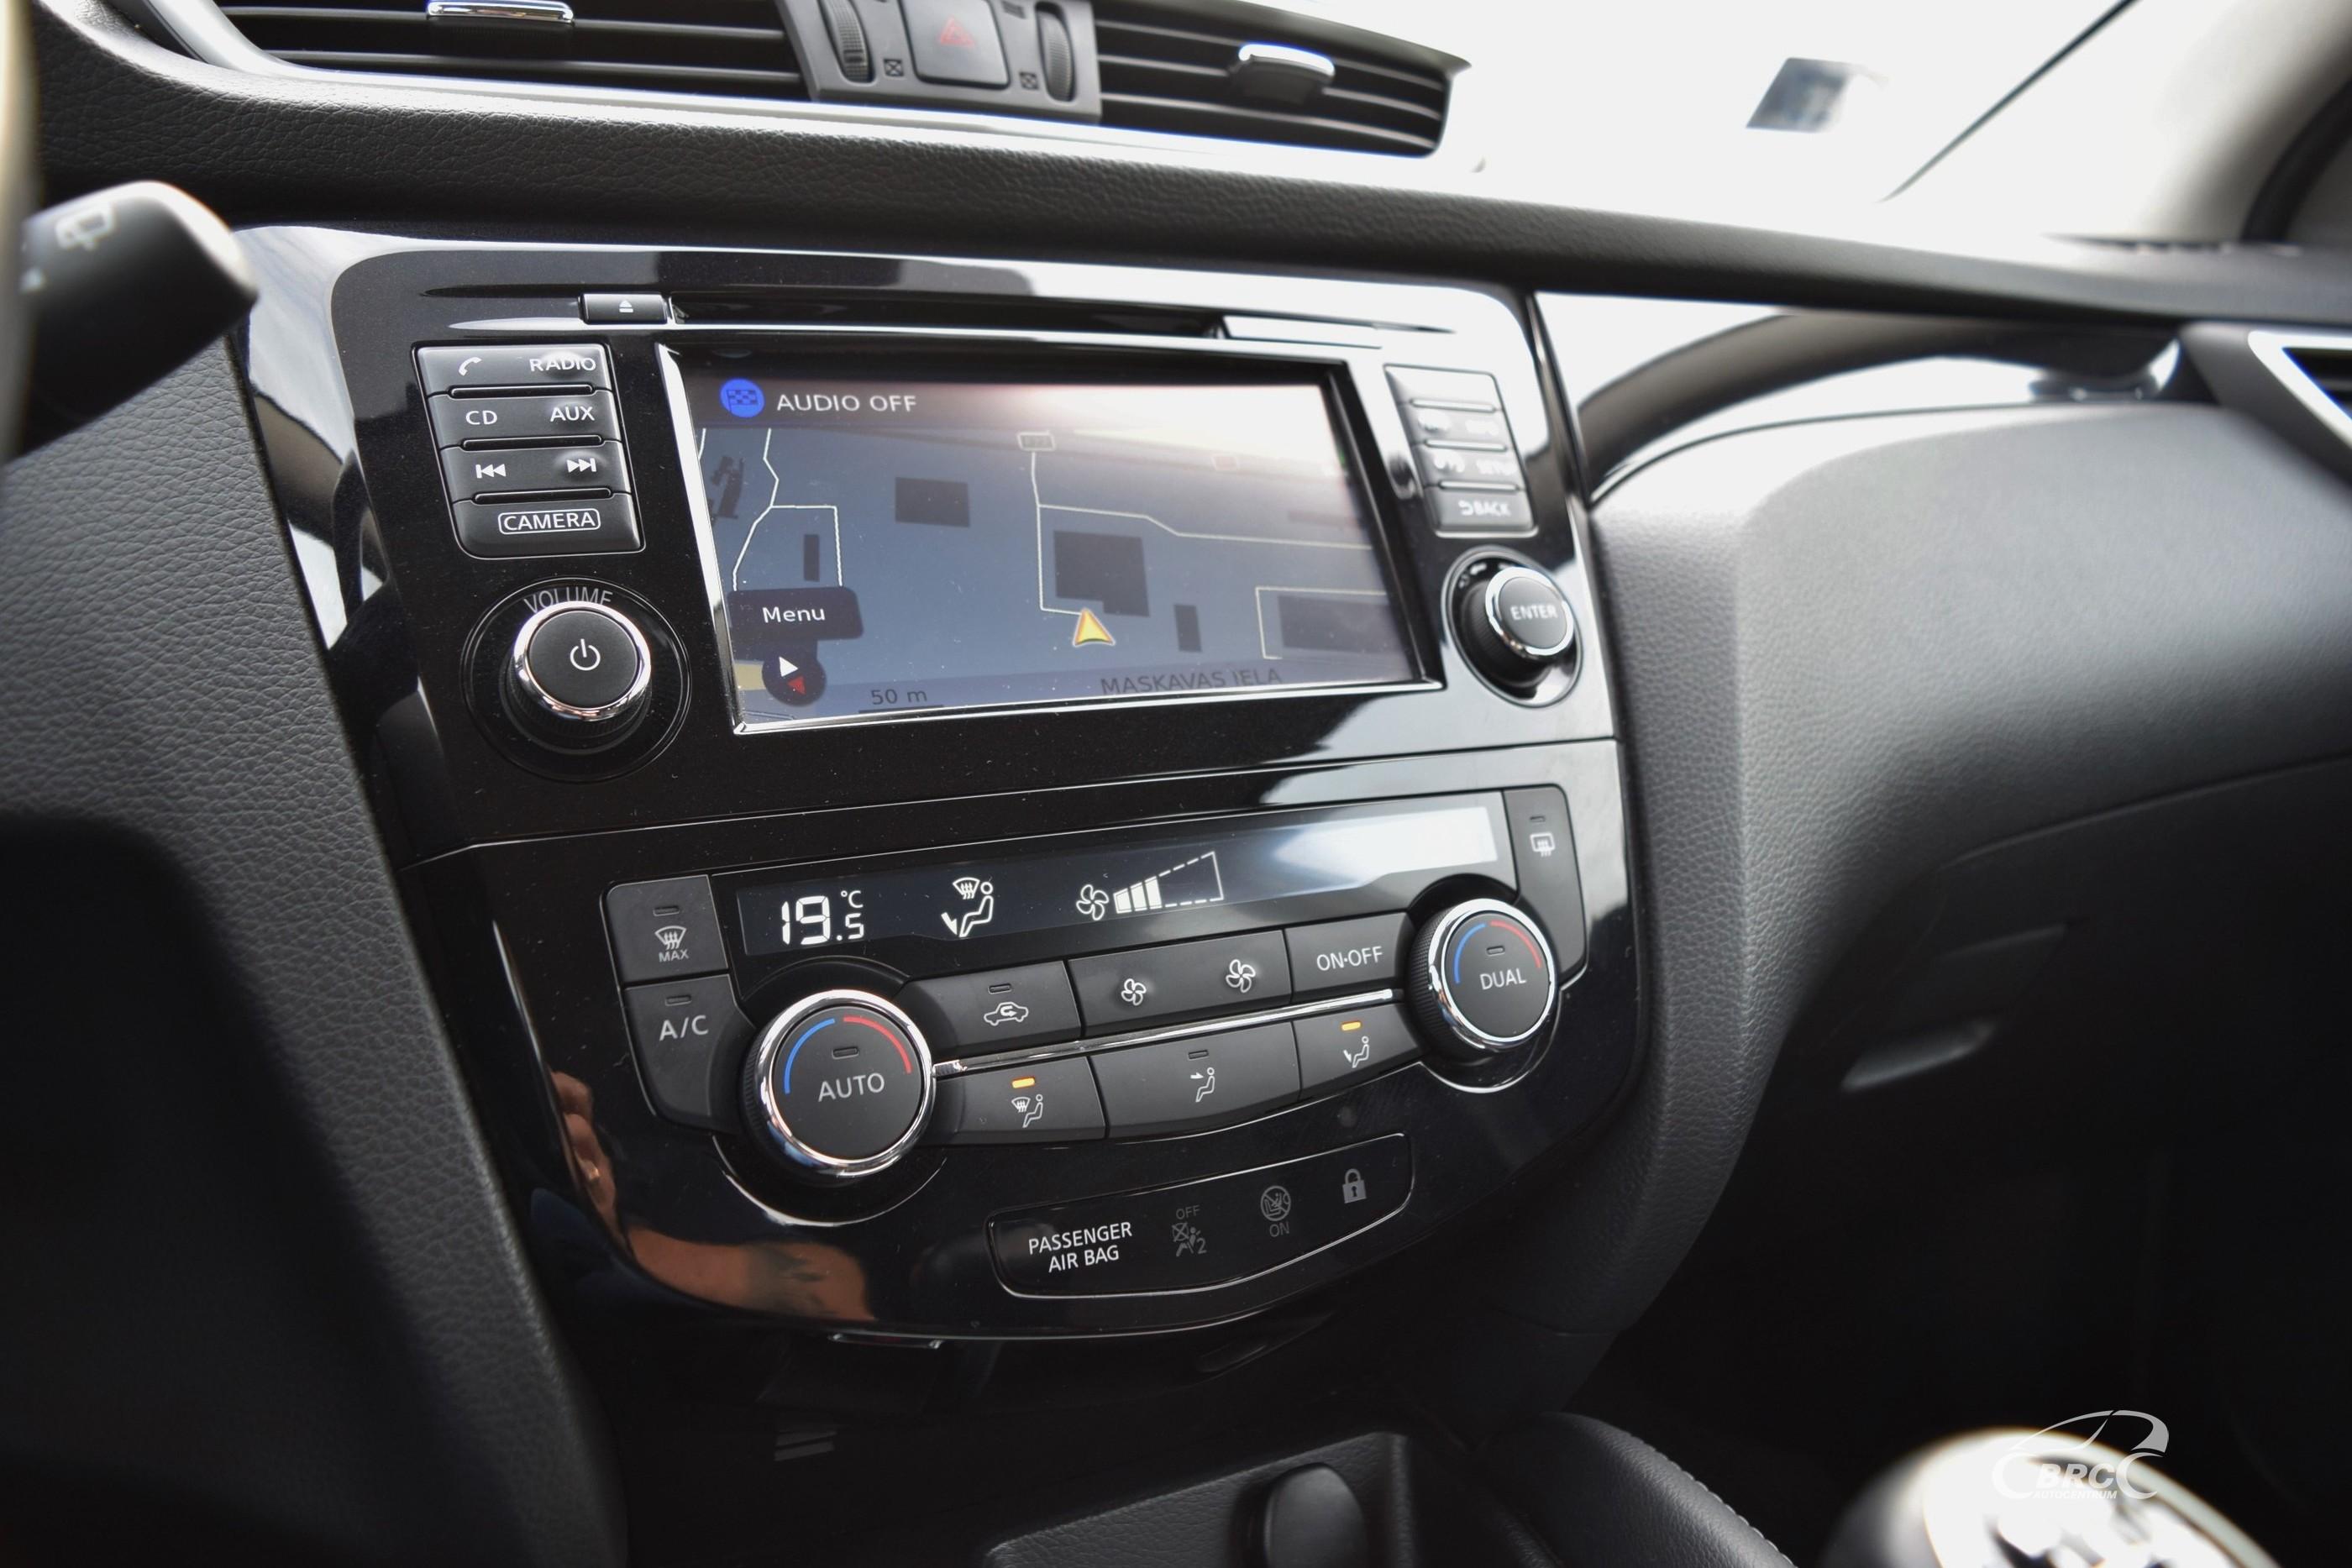 Nissan Qashqai FWD M/T